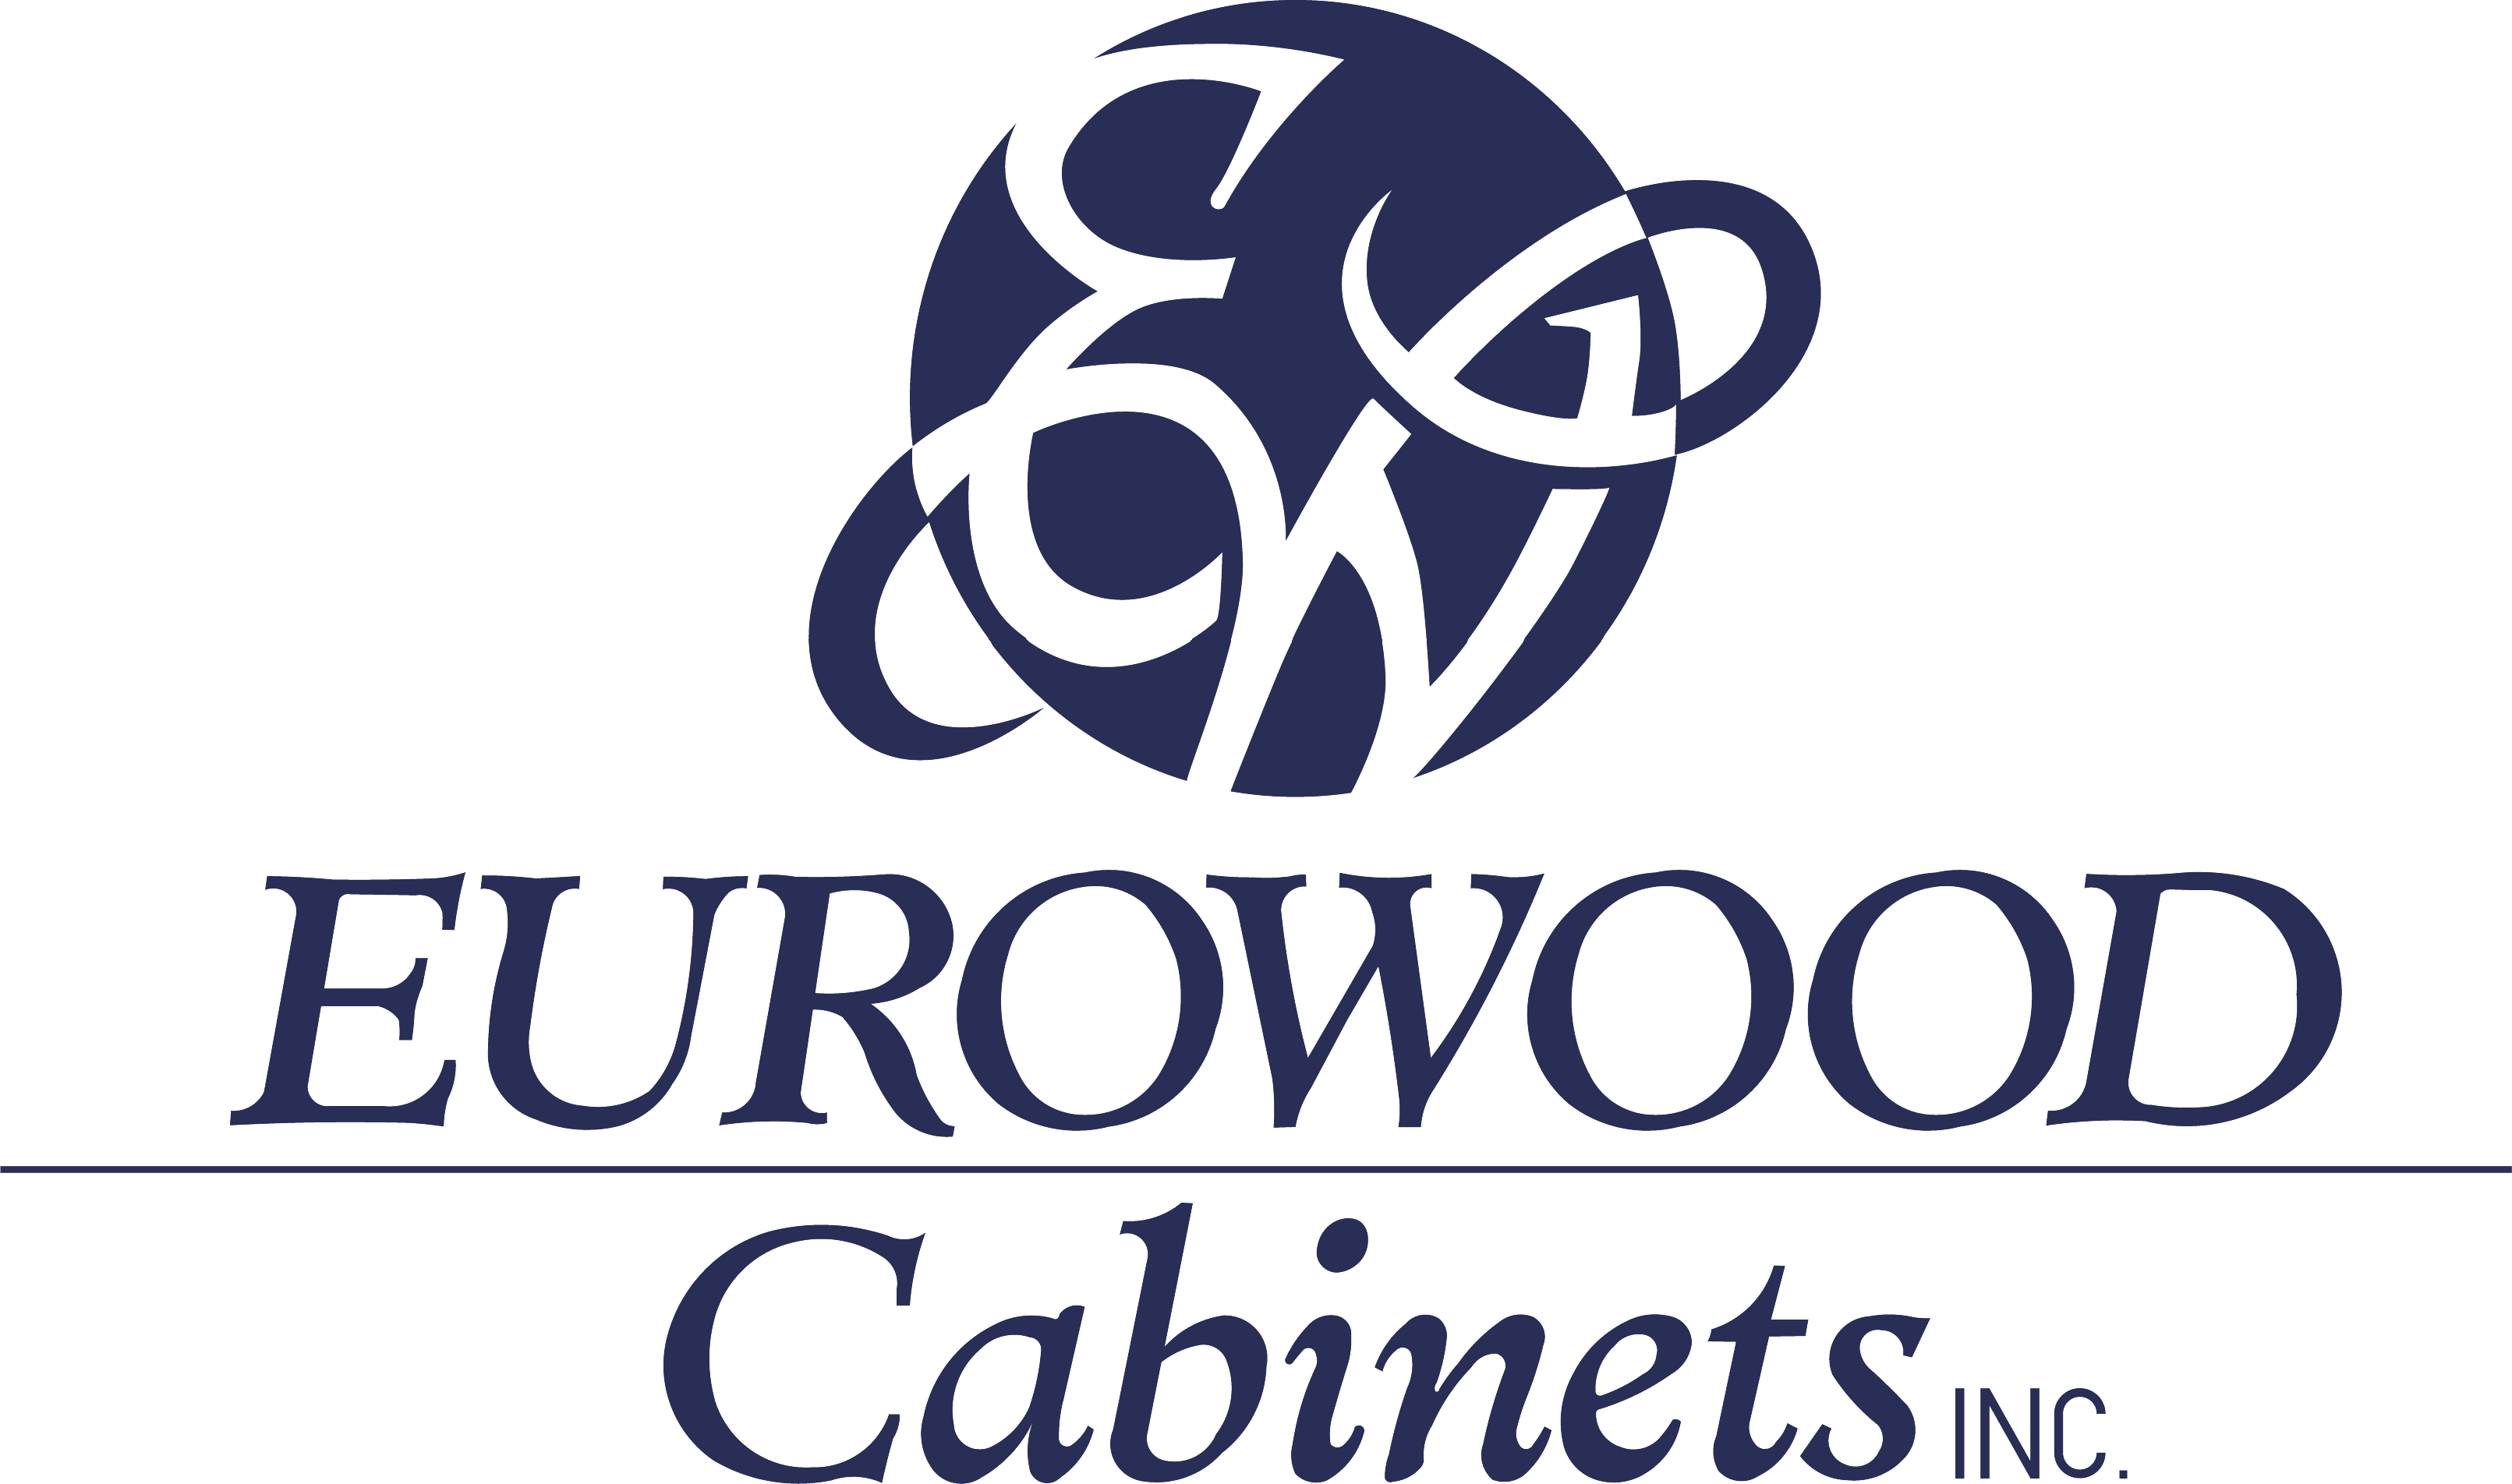 Eurowood Cabinets, Inc.   Beautiful Custom Cabinetry